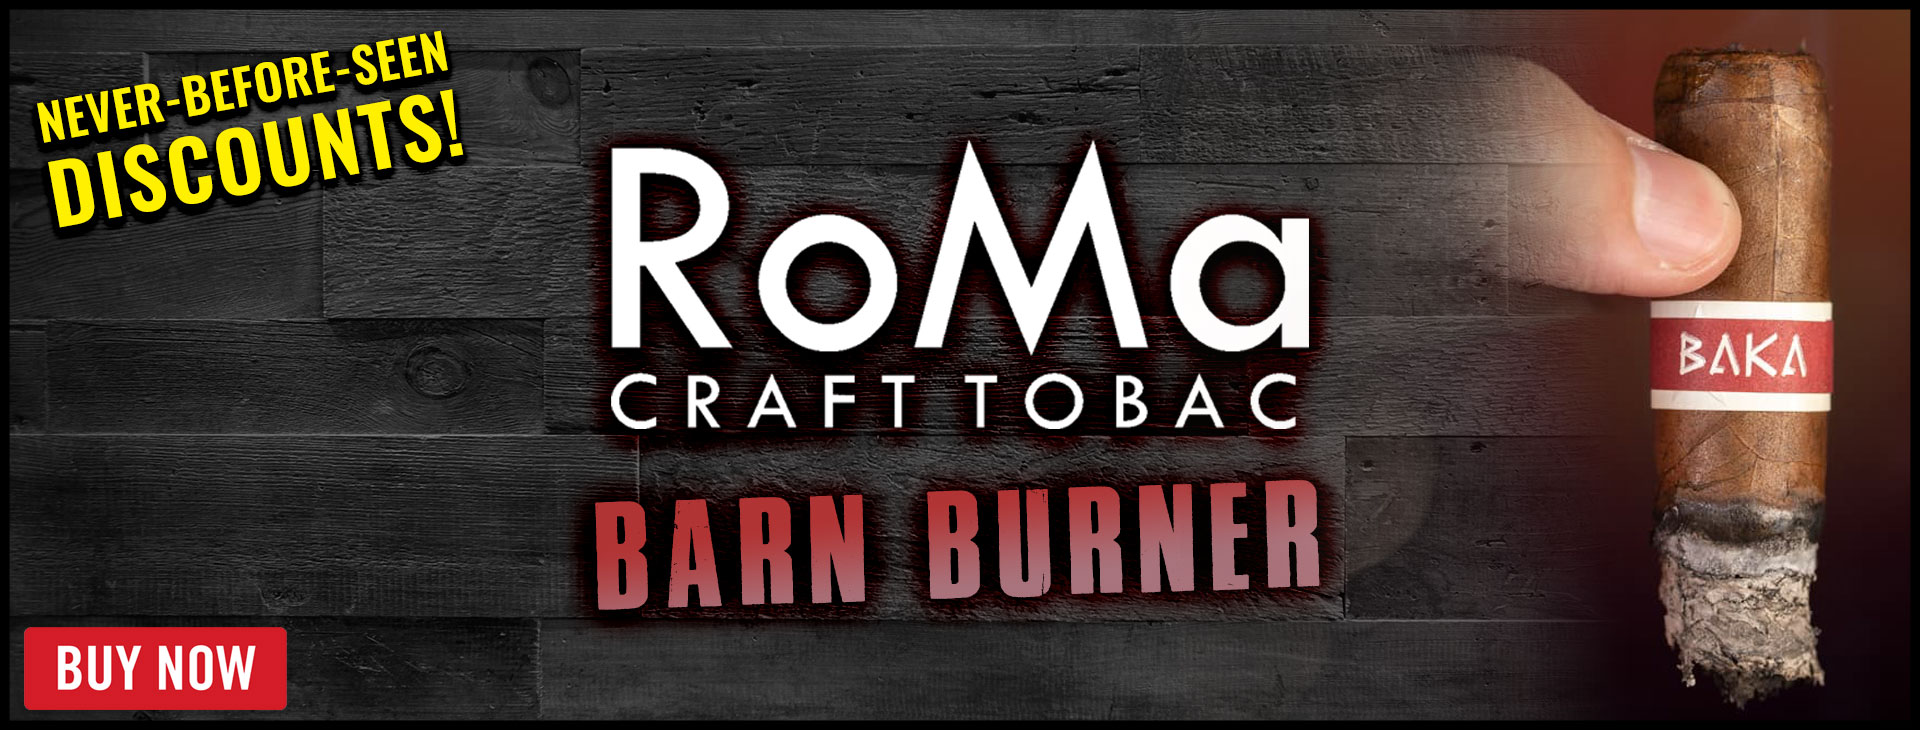 roma-craft-2021-barn-burner-banner.jpg